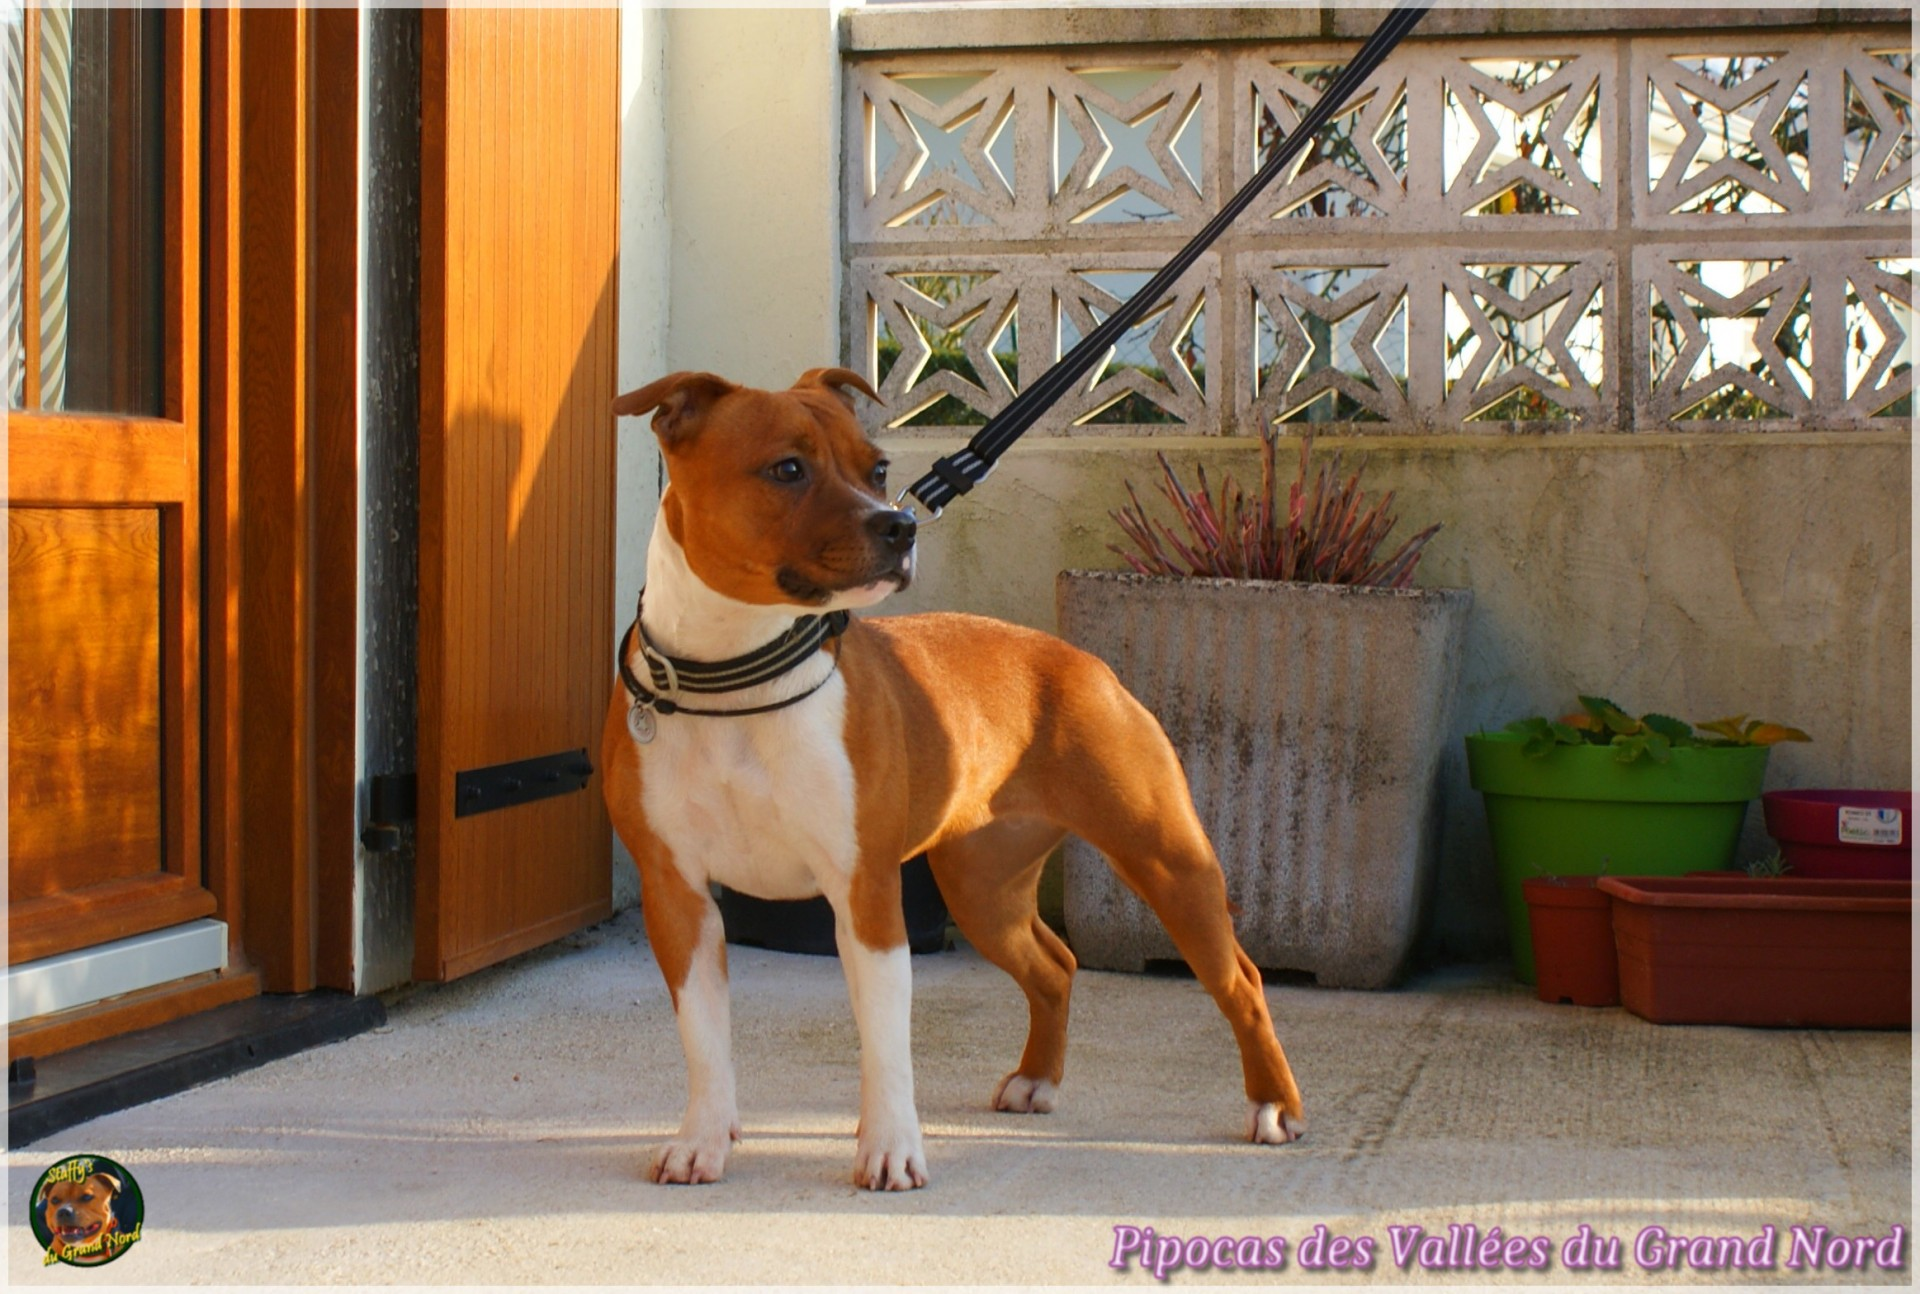 Pipocas (Kalye)